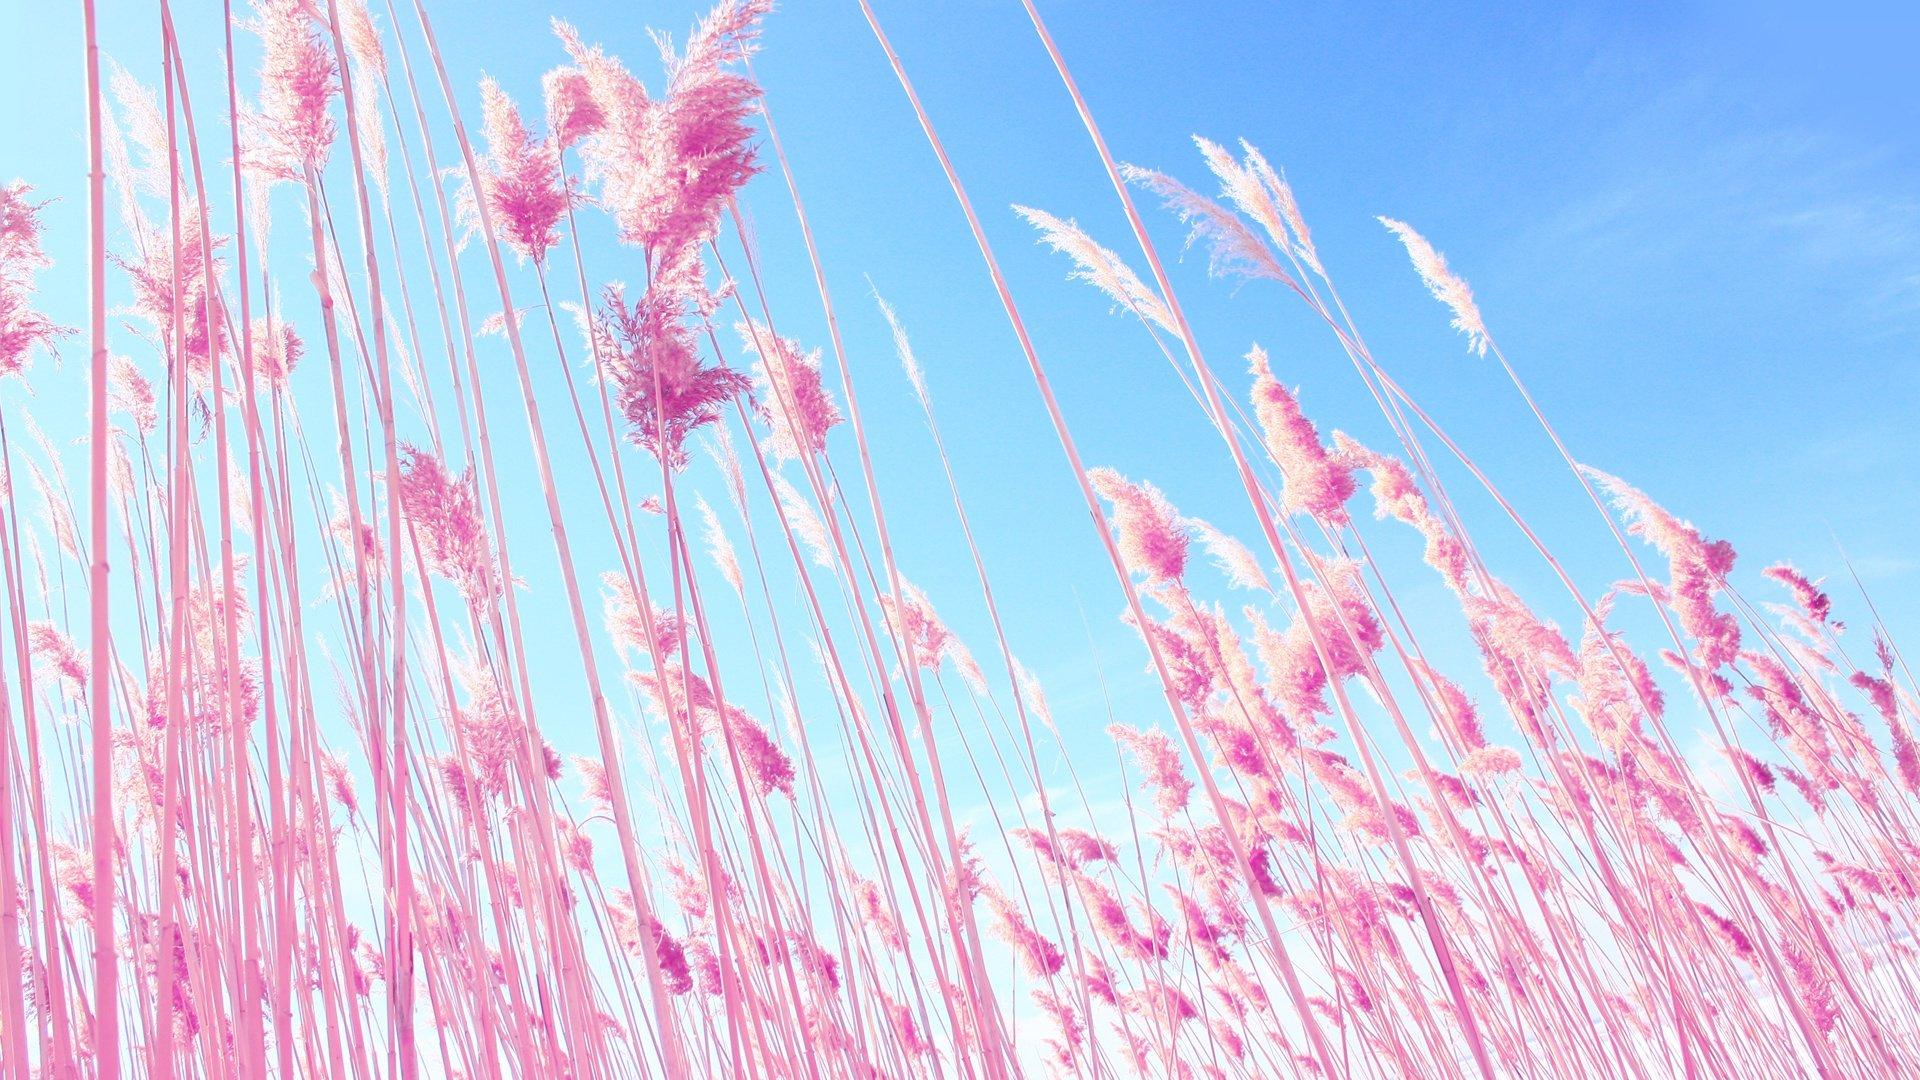 Pink Sky wallpaper photo hd